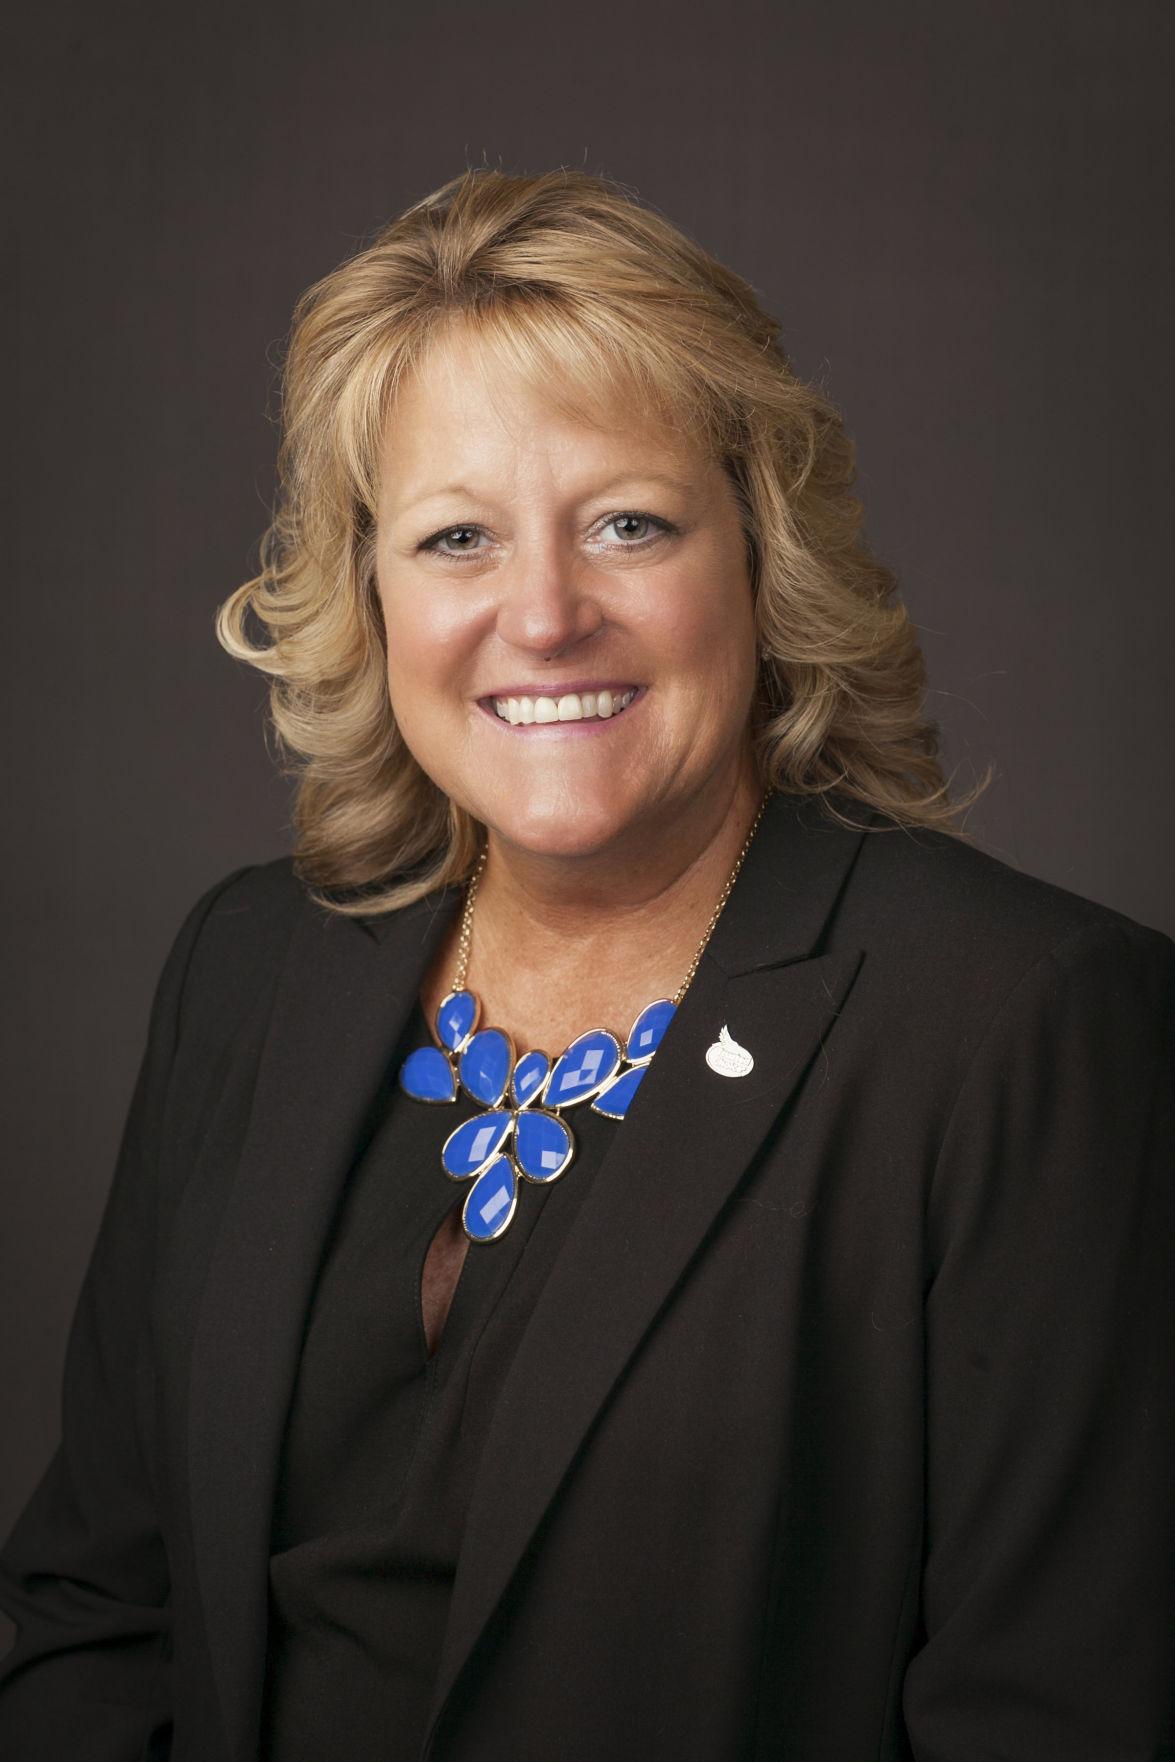 Cindy Jackman